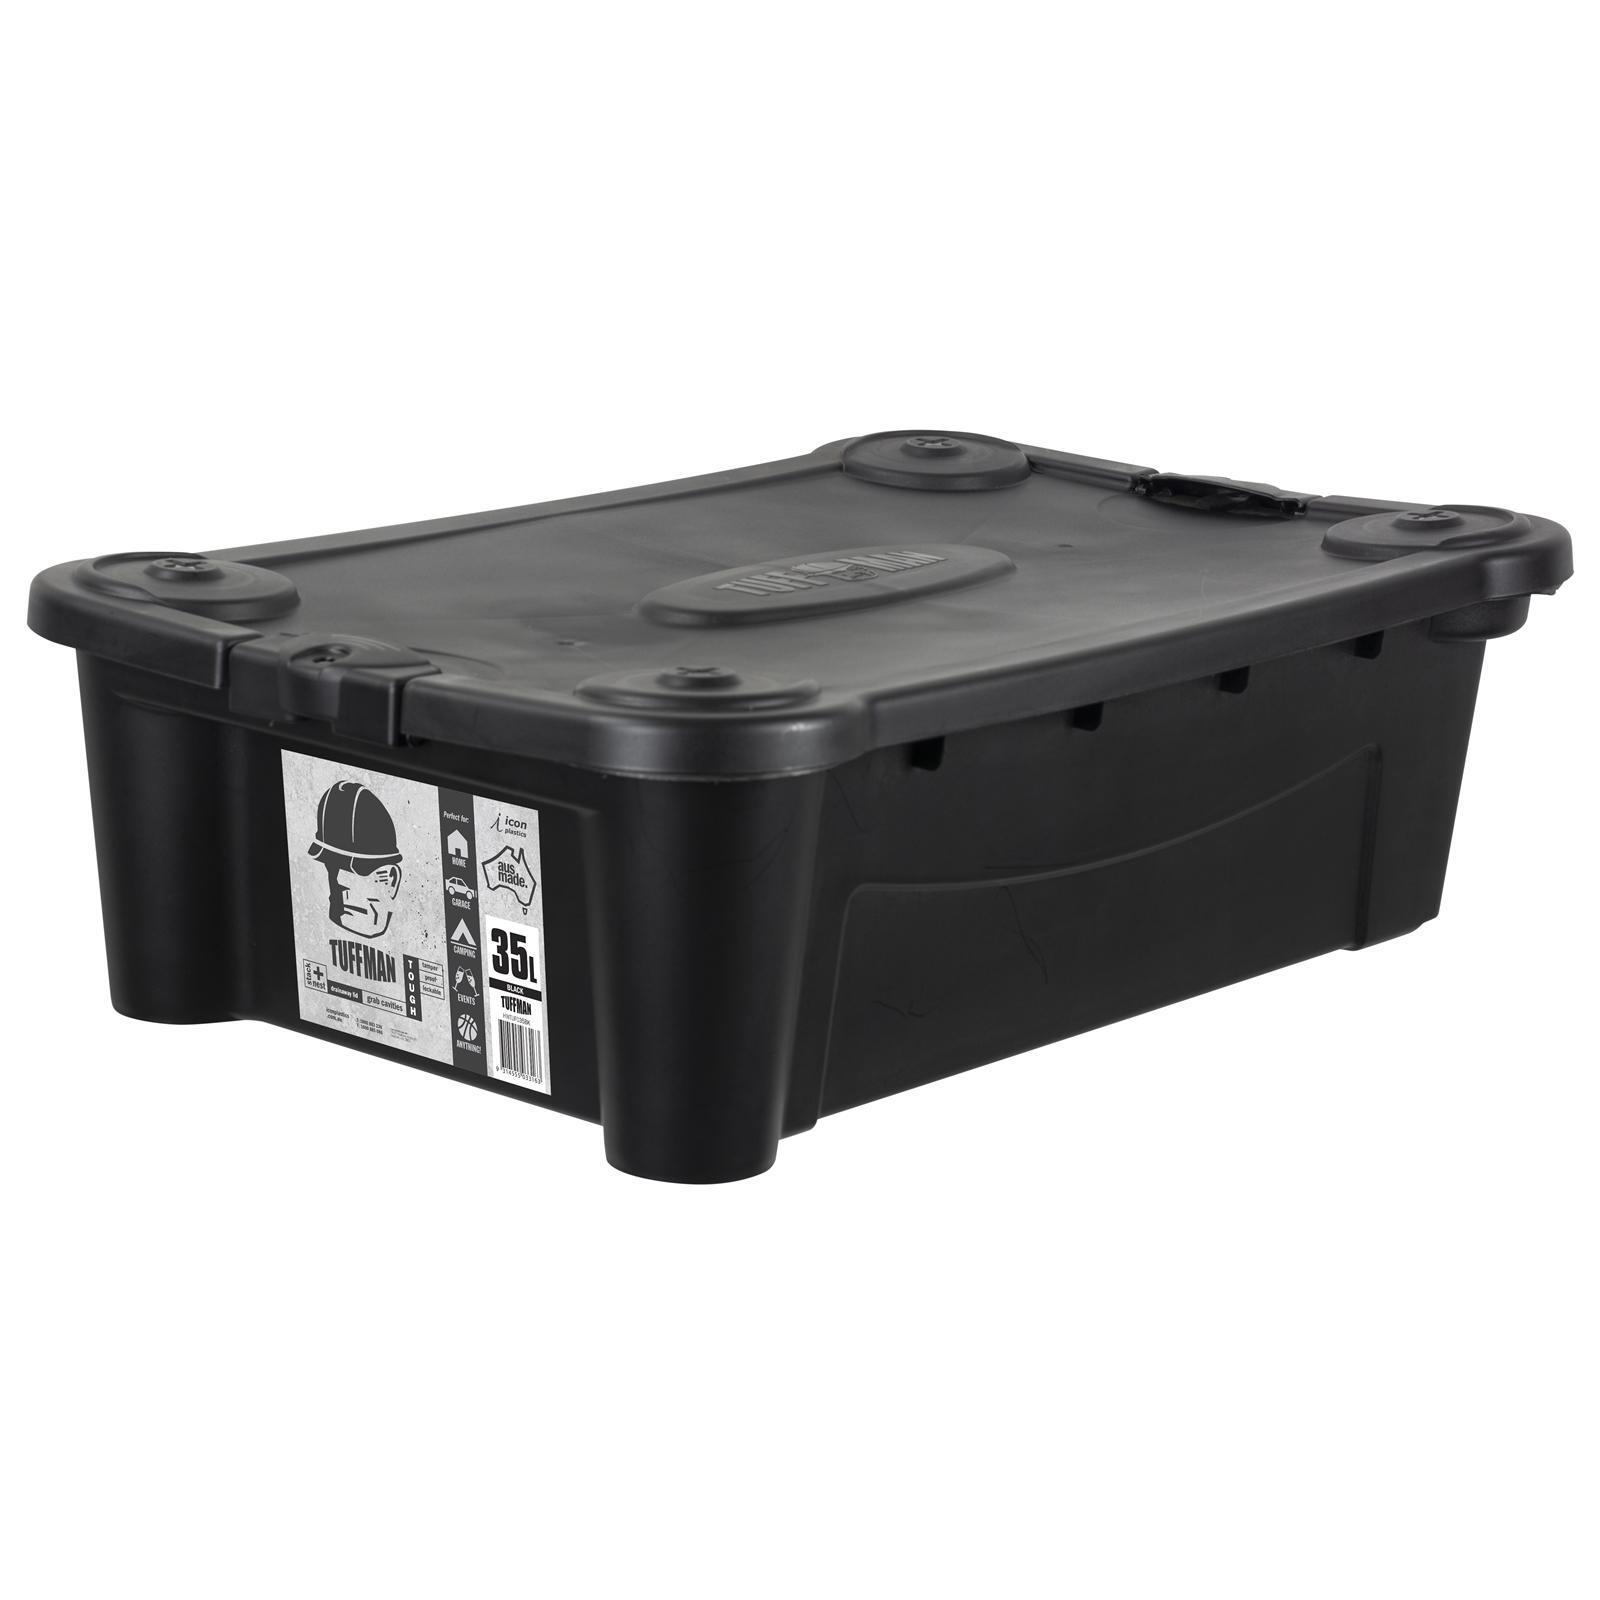 Icon Plastics 35L Black Tuffman Heavy Duty Storage Container